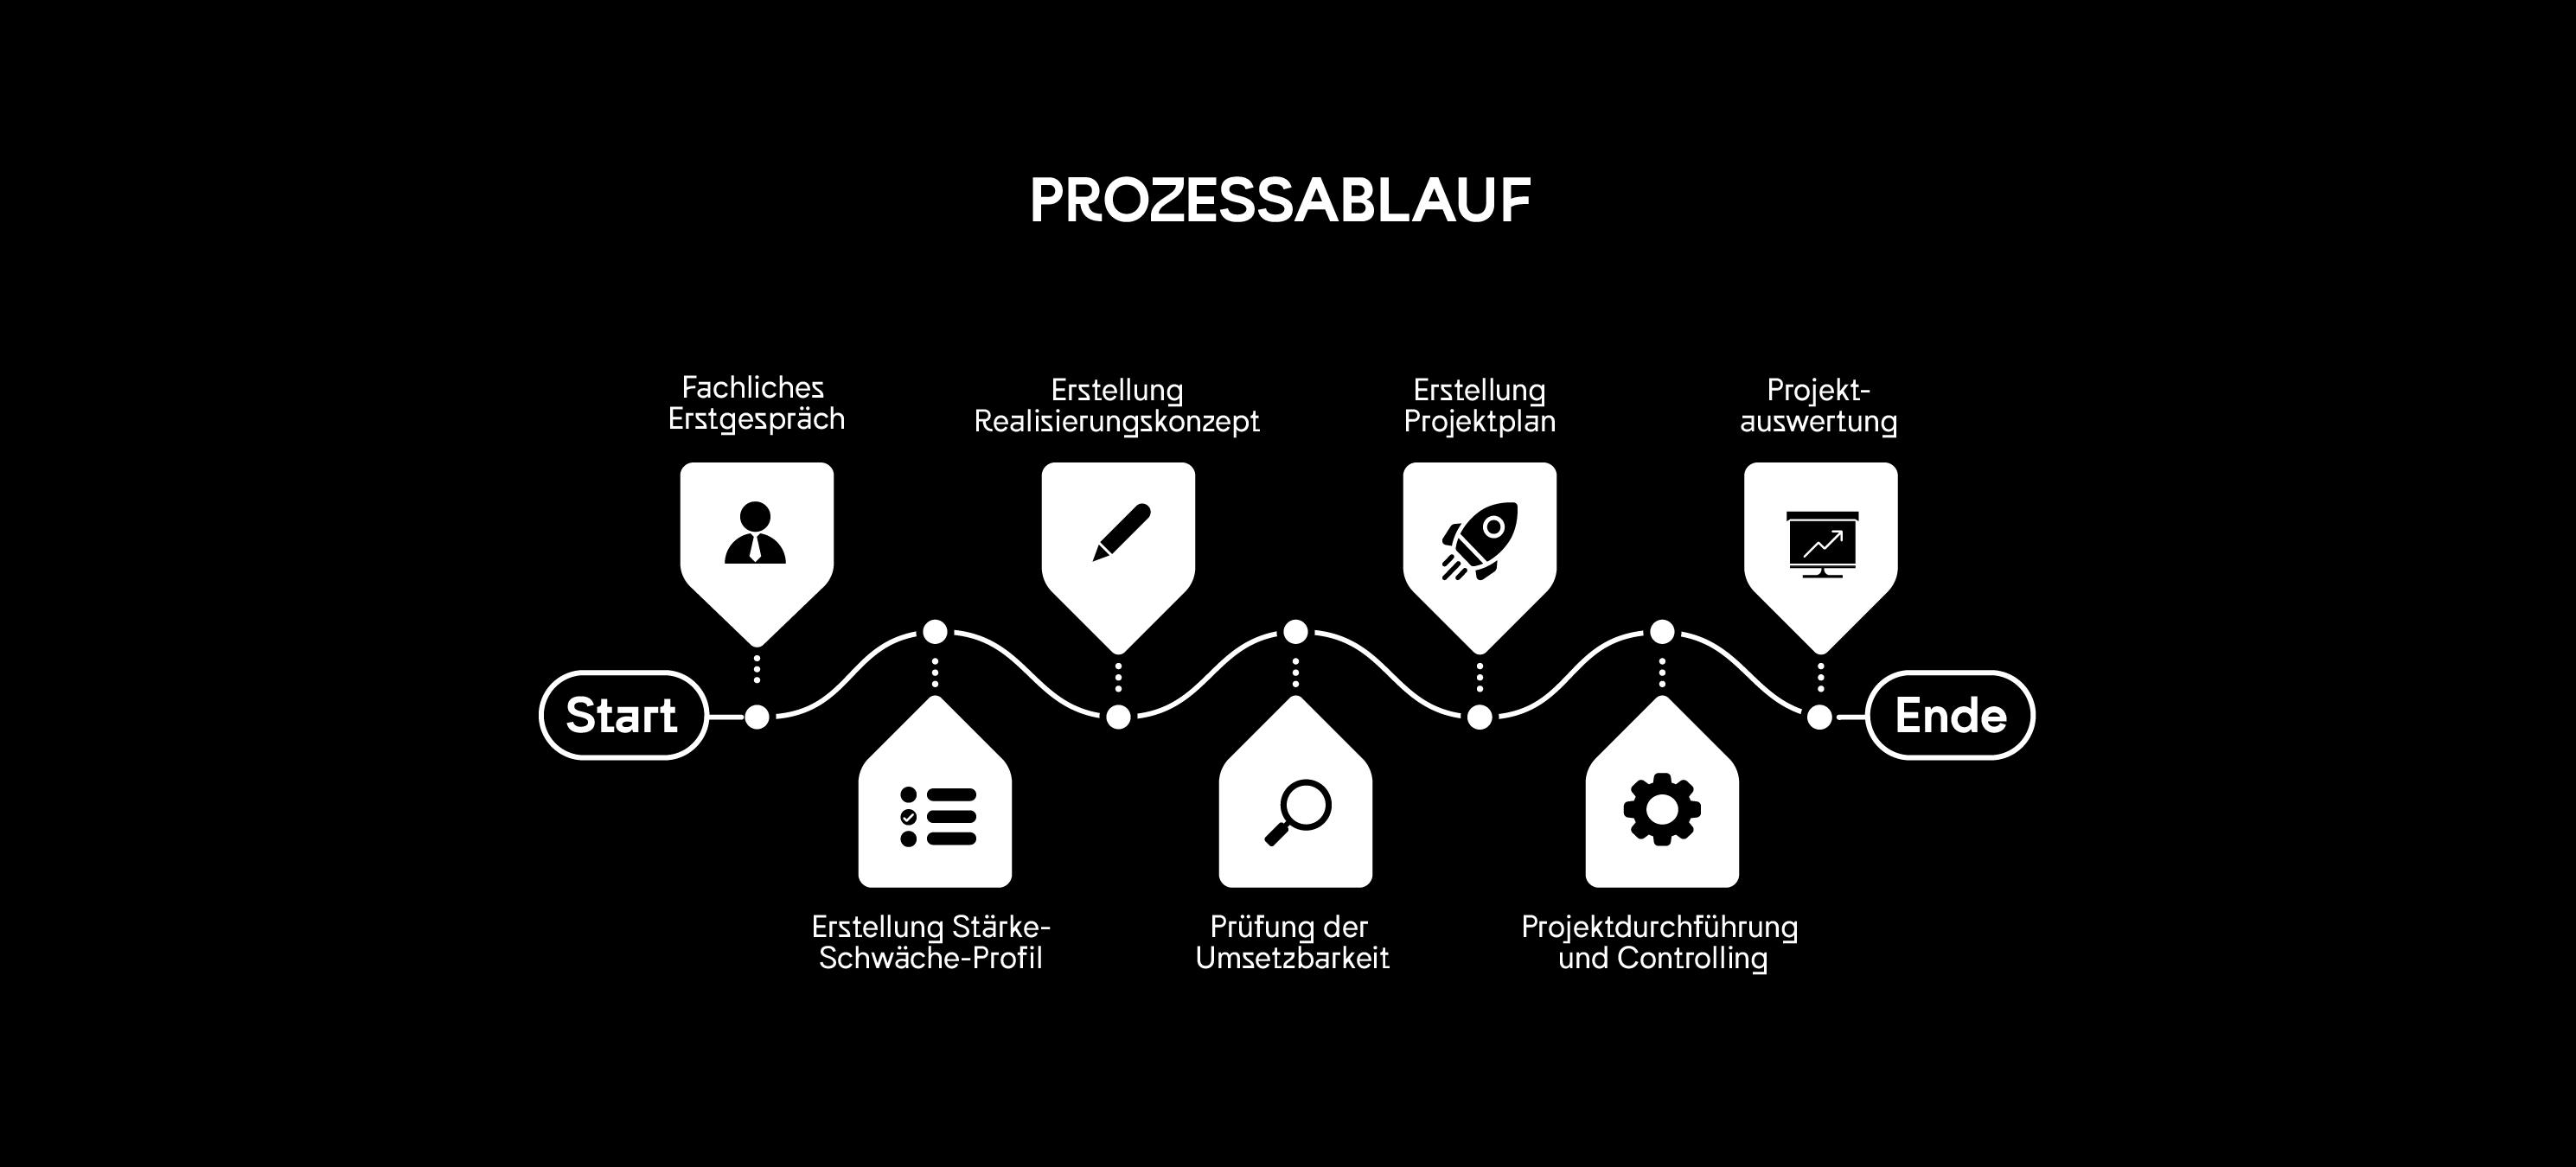 go-digital Prozess als Grafik dargestellt